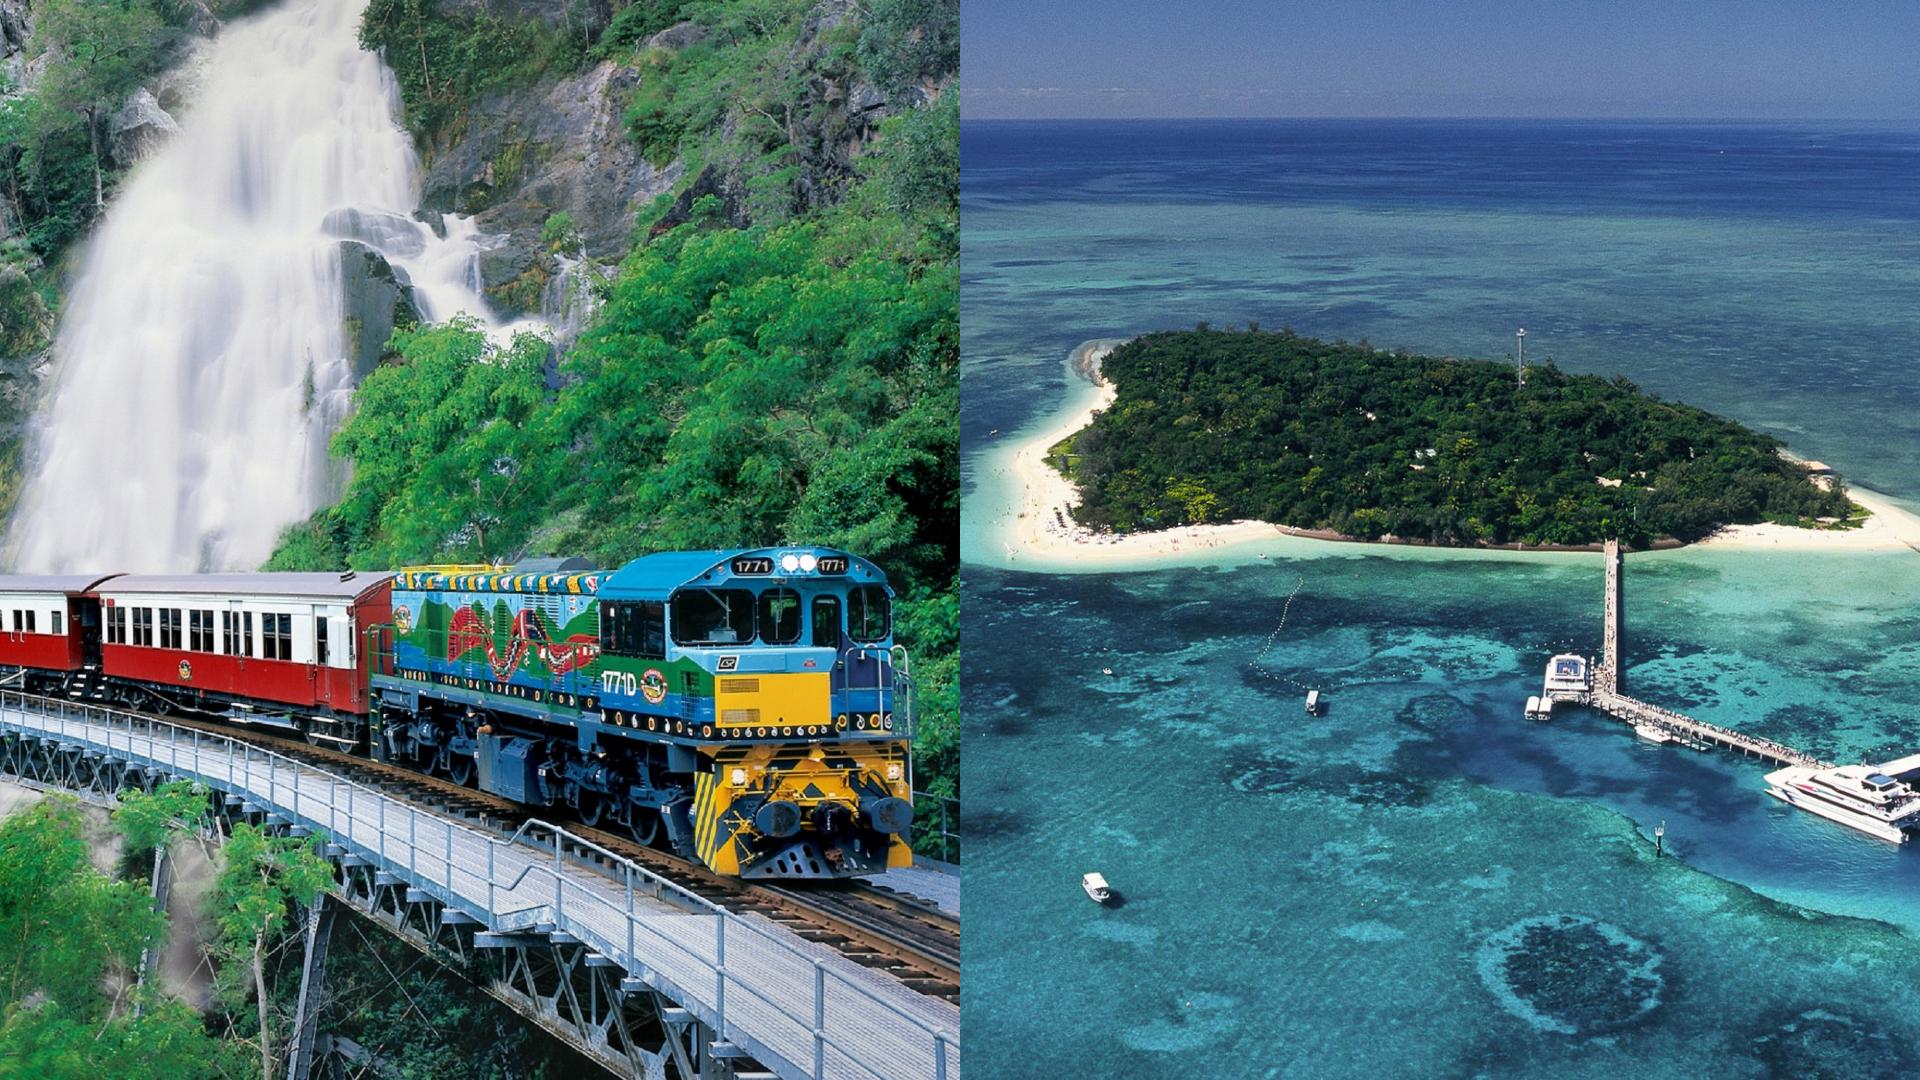 Kuranda (Skyrail & Train) + Green Island - 2 Day Package